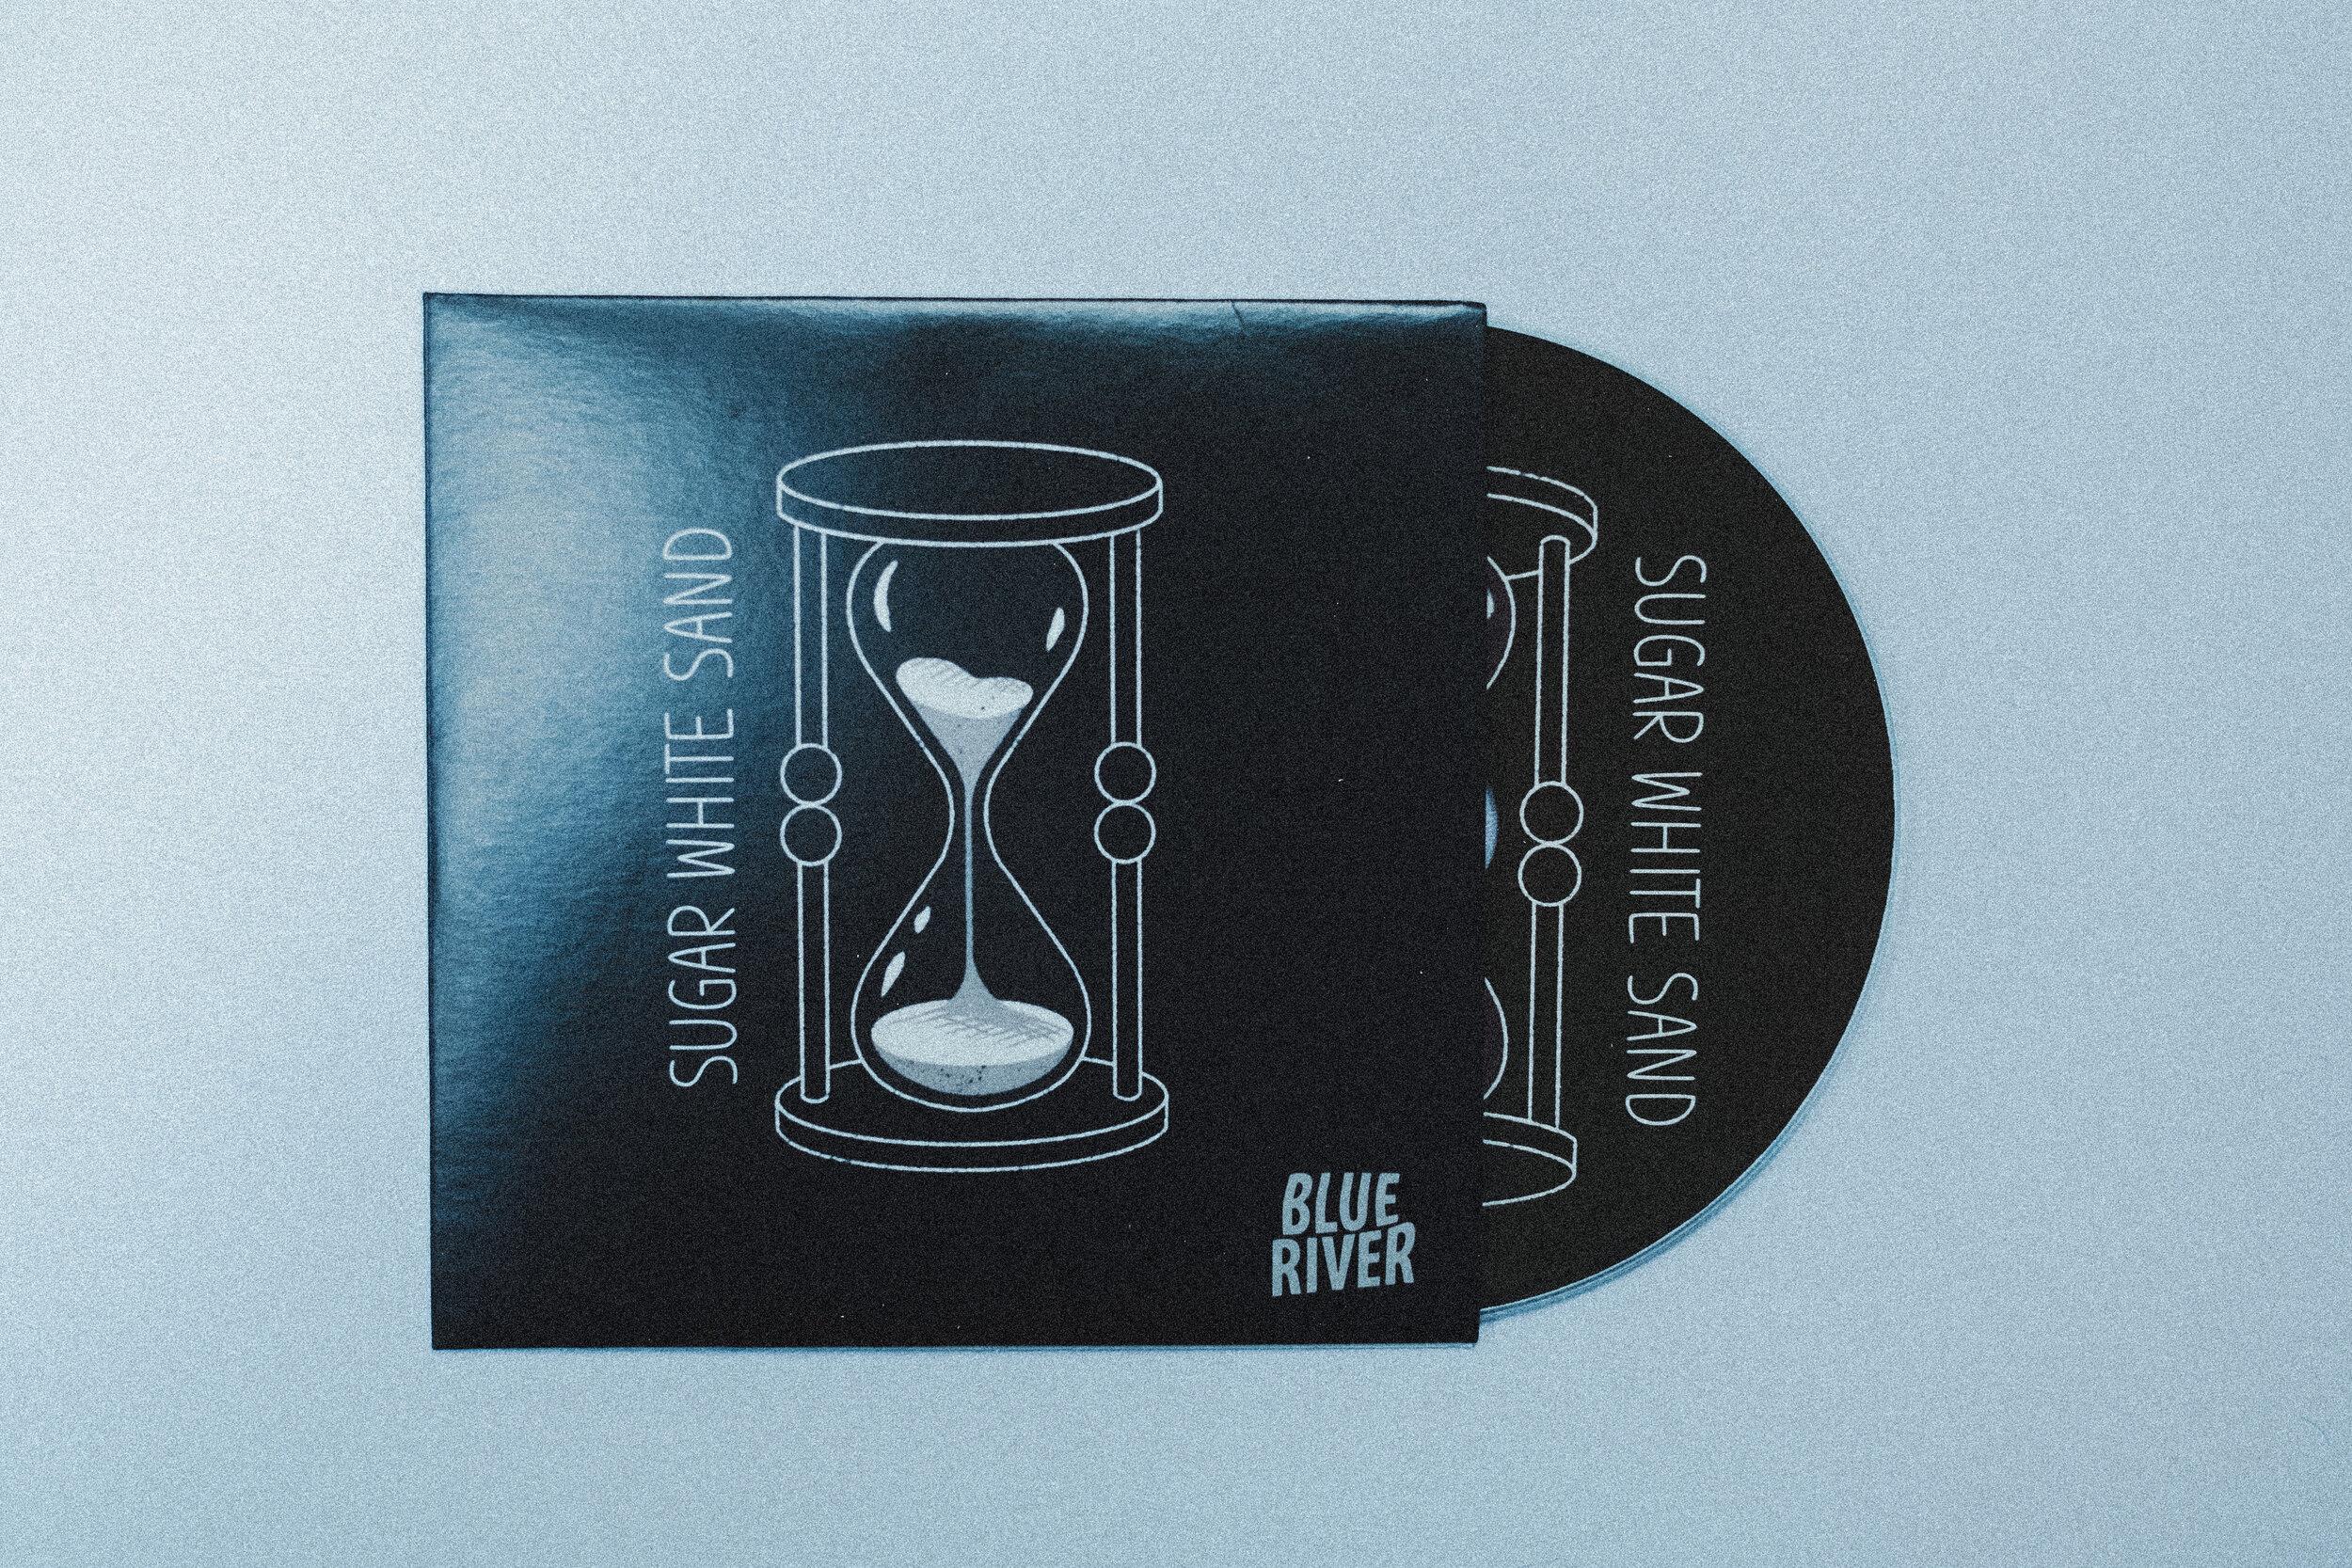 blue river single signing hmv october 2019 (5).jpg